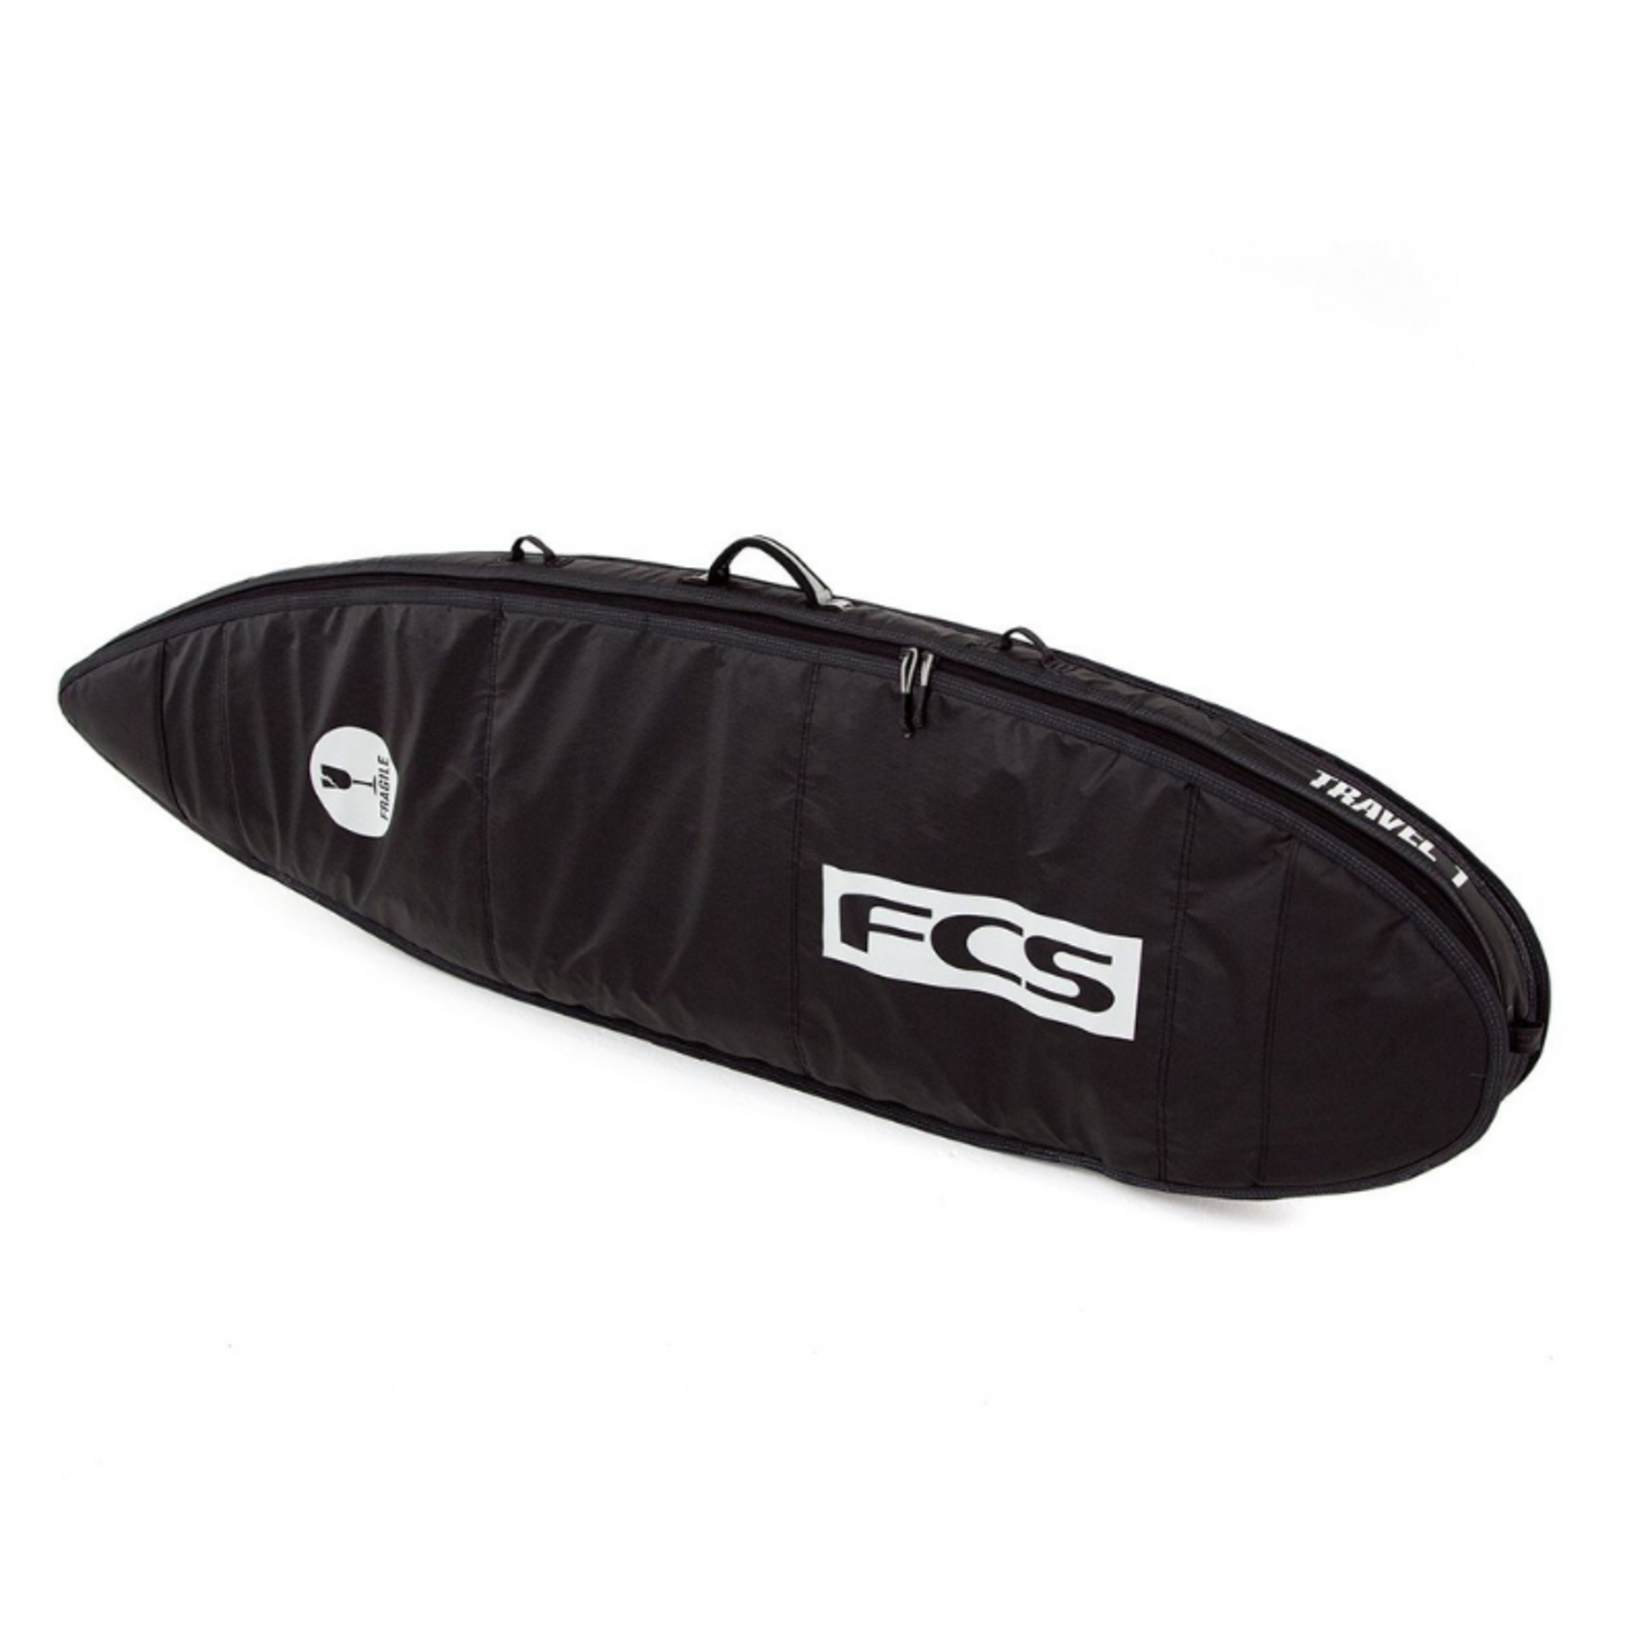 FCS FCS Travel 1 Fun Board Bags.